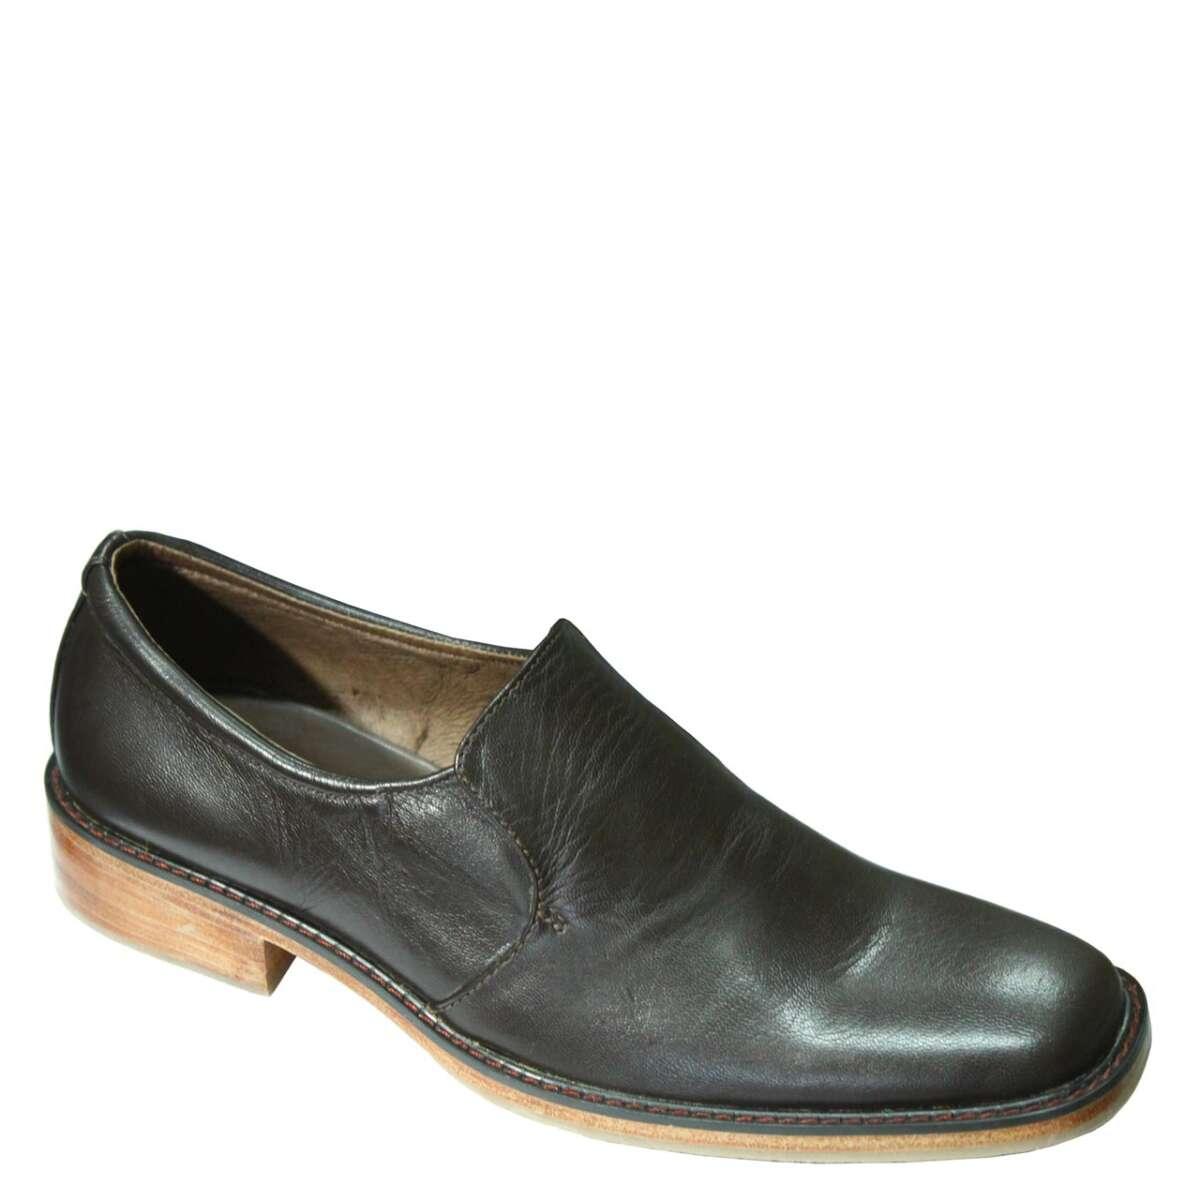 Giày nam da bò B870a